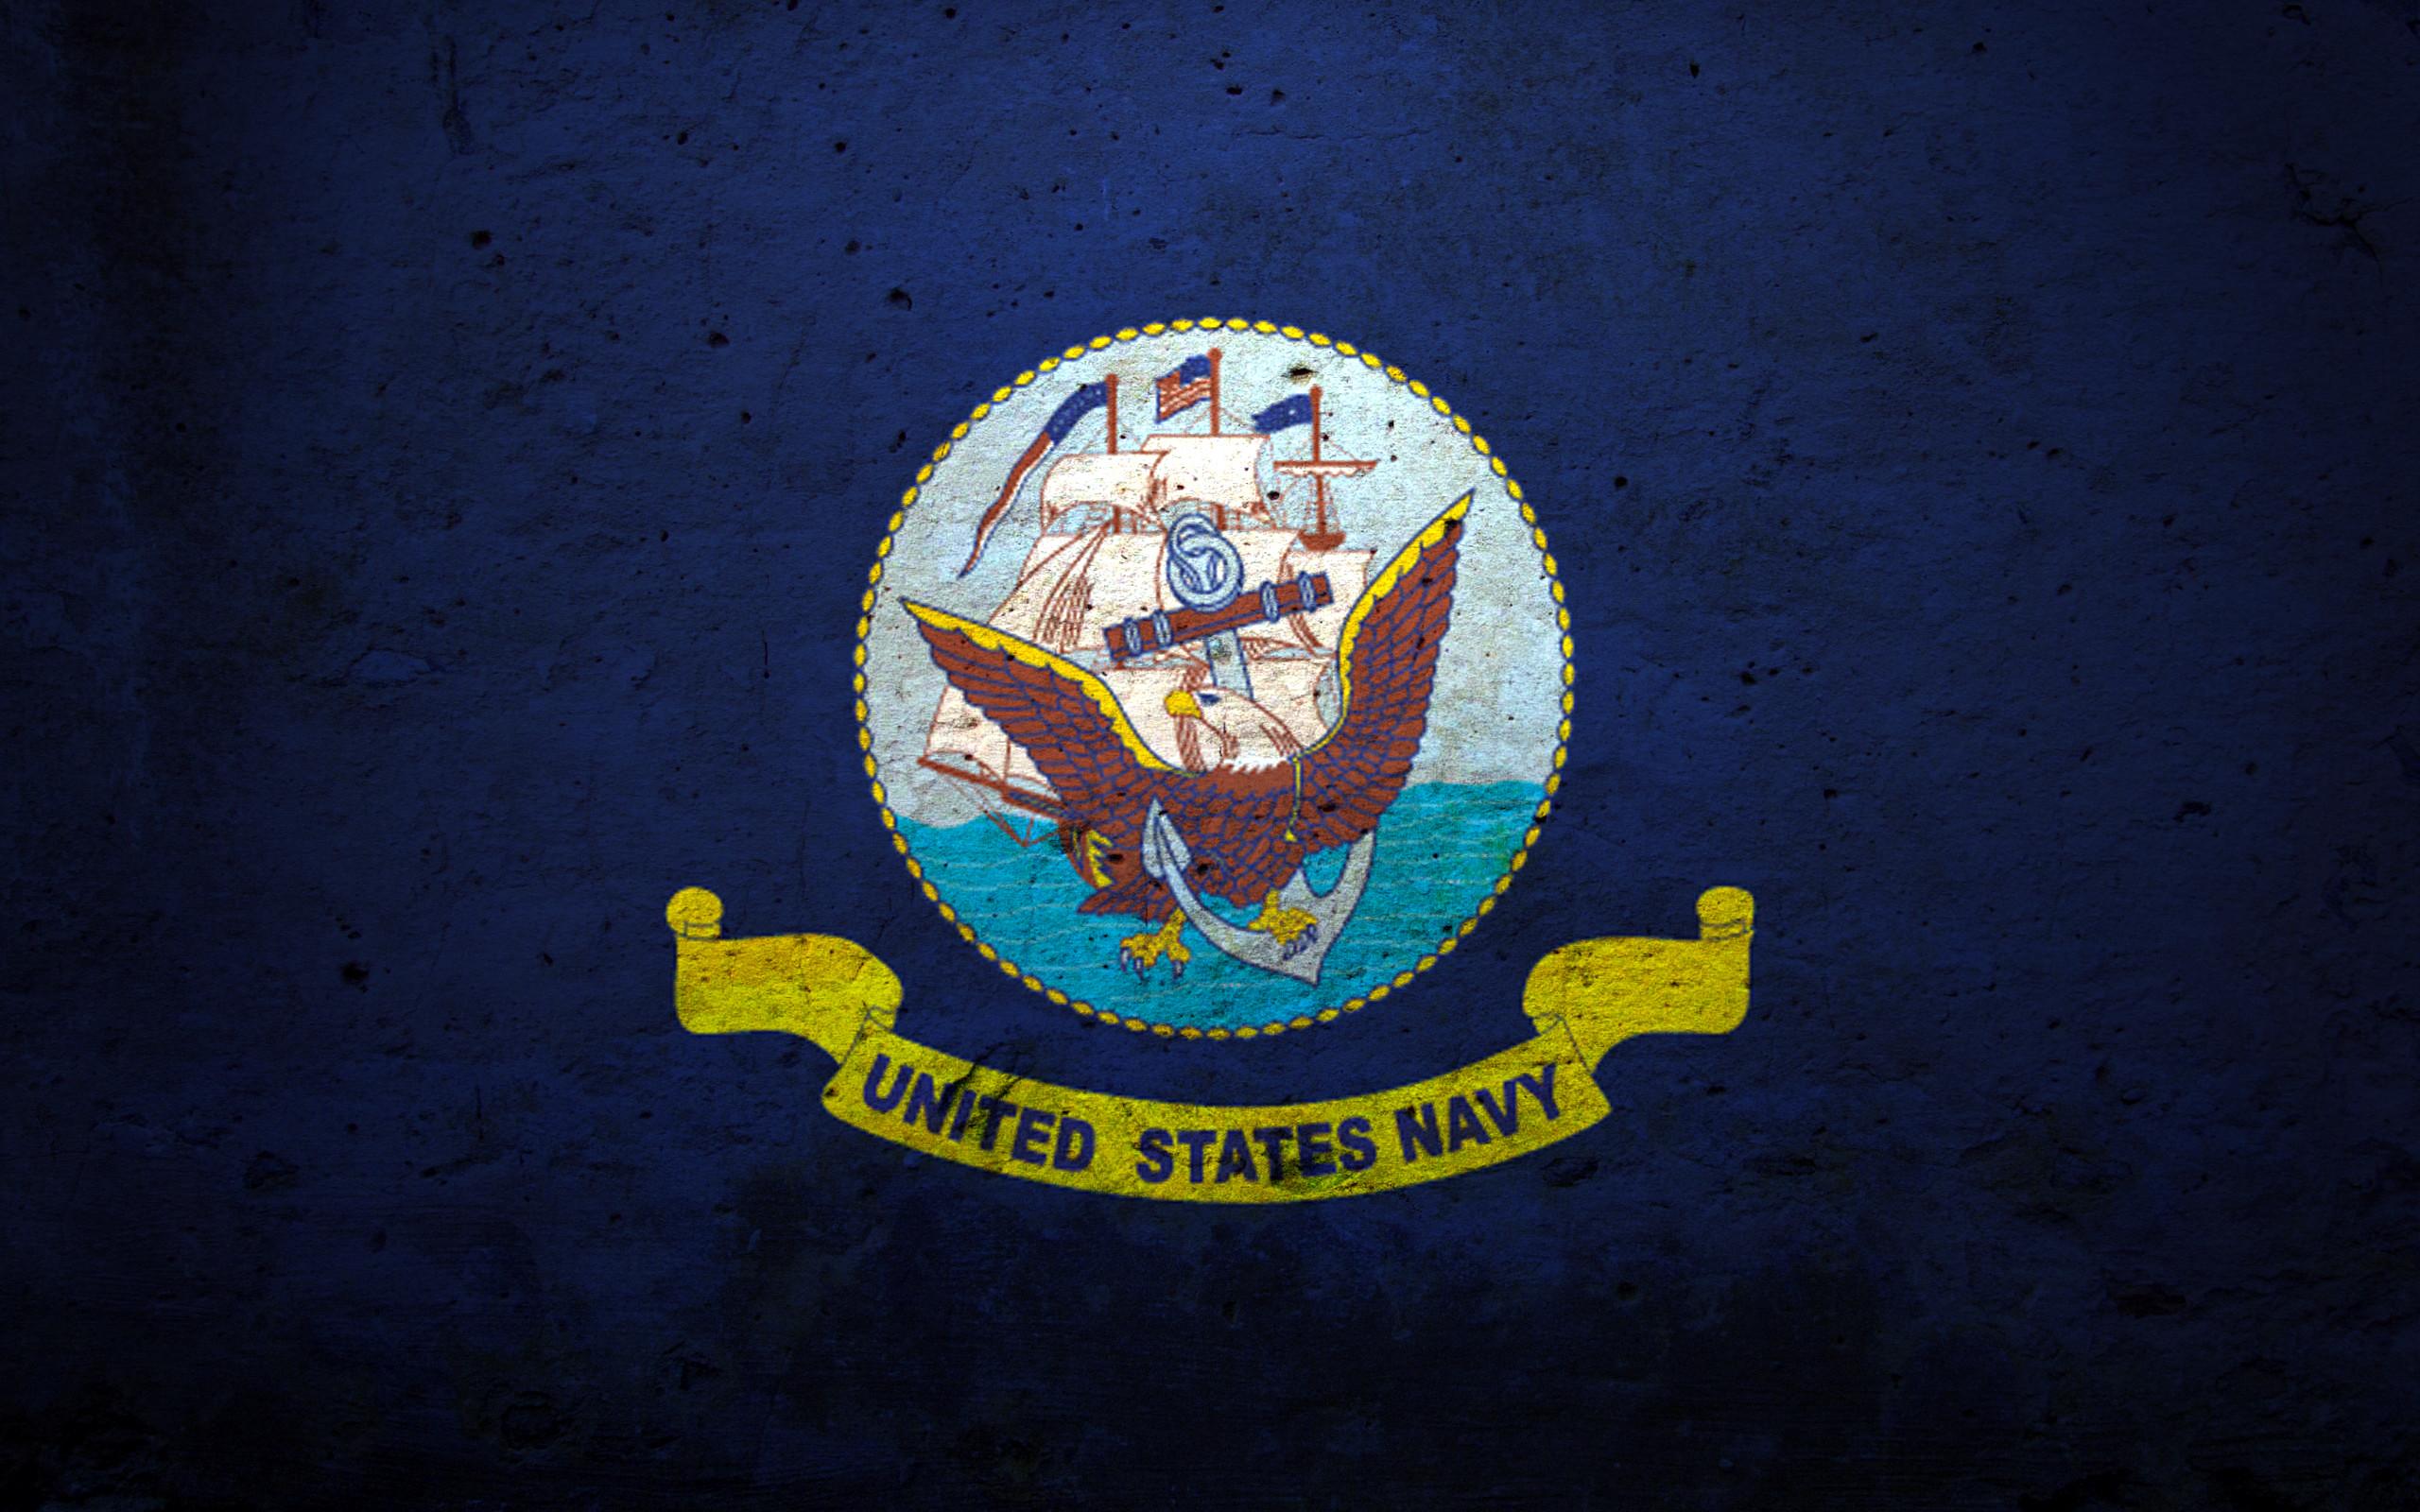 US Navy Wallpaper US, Navy, Flags